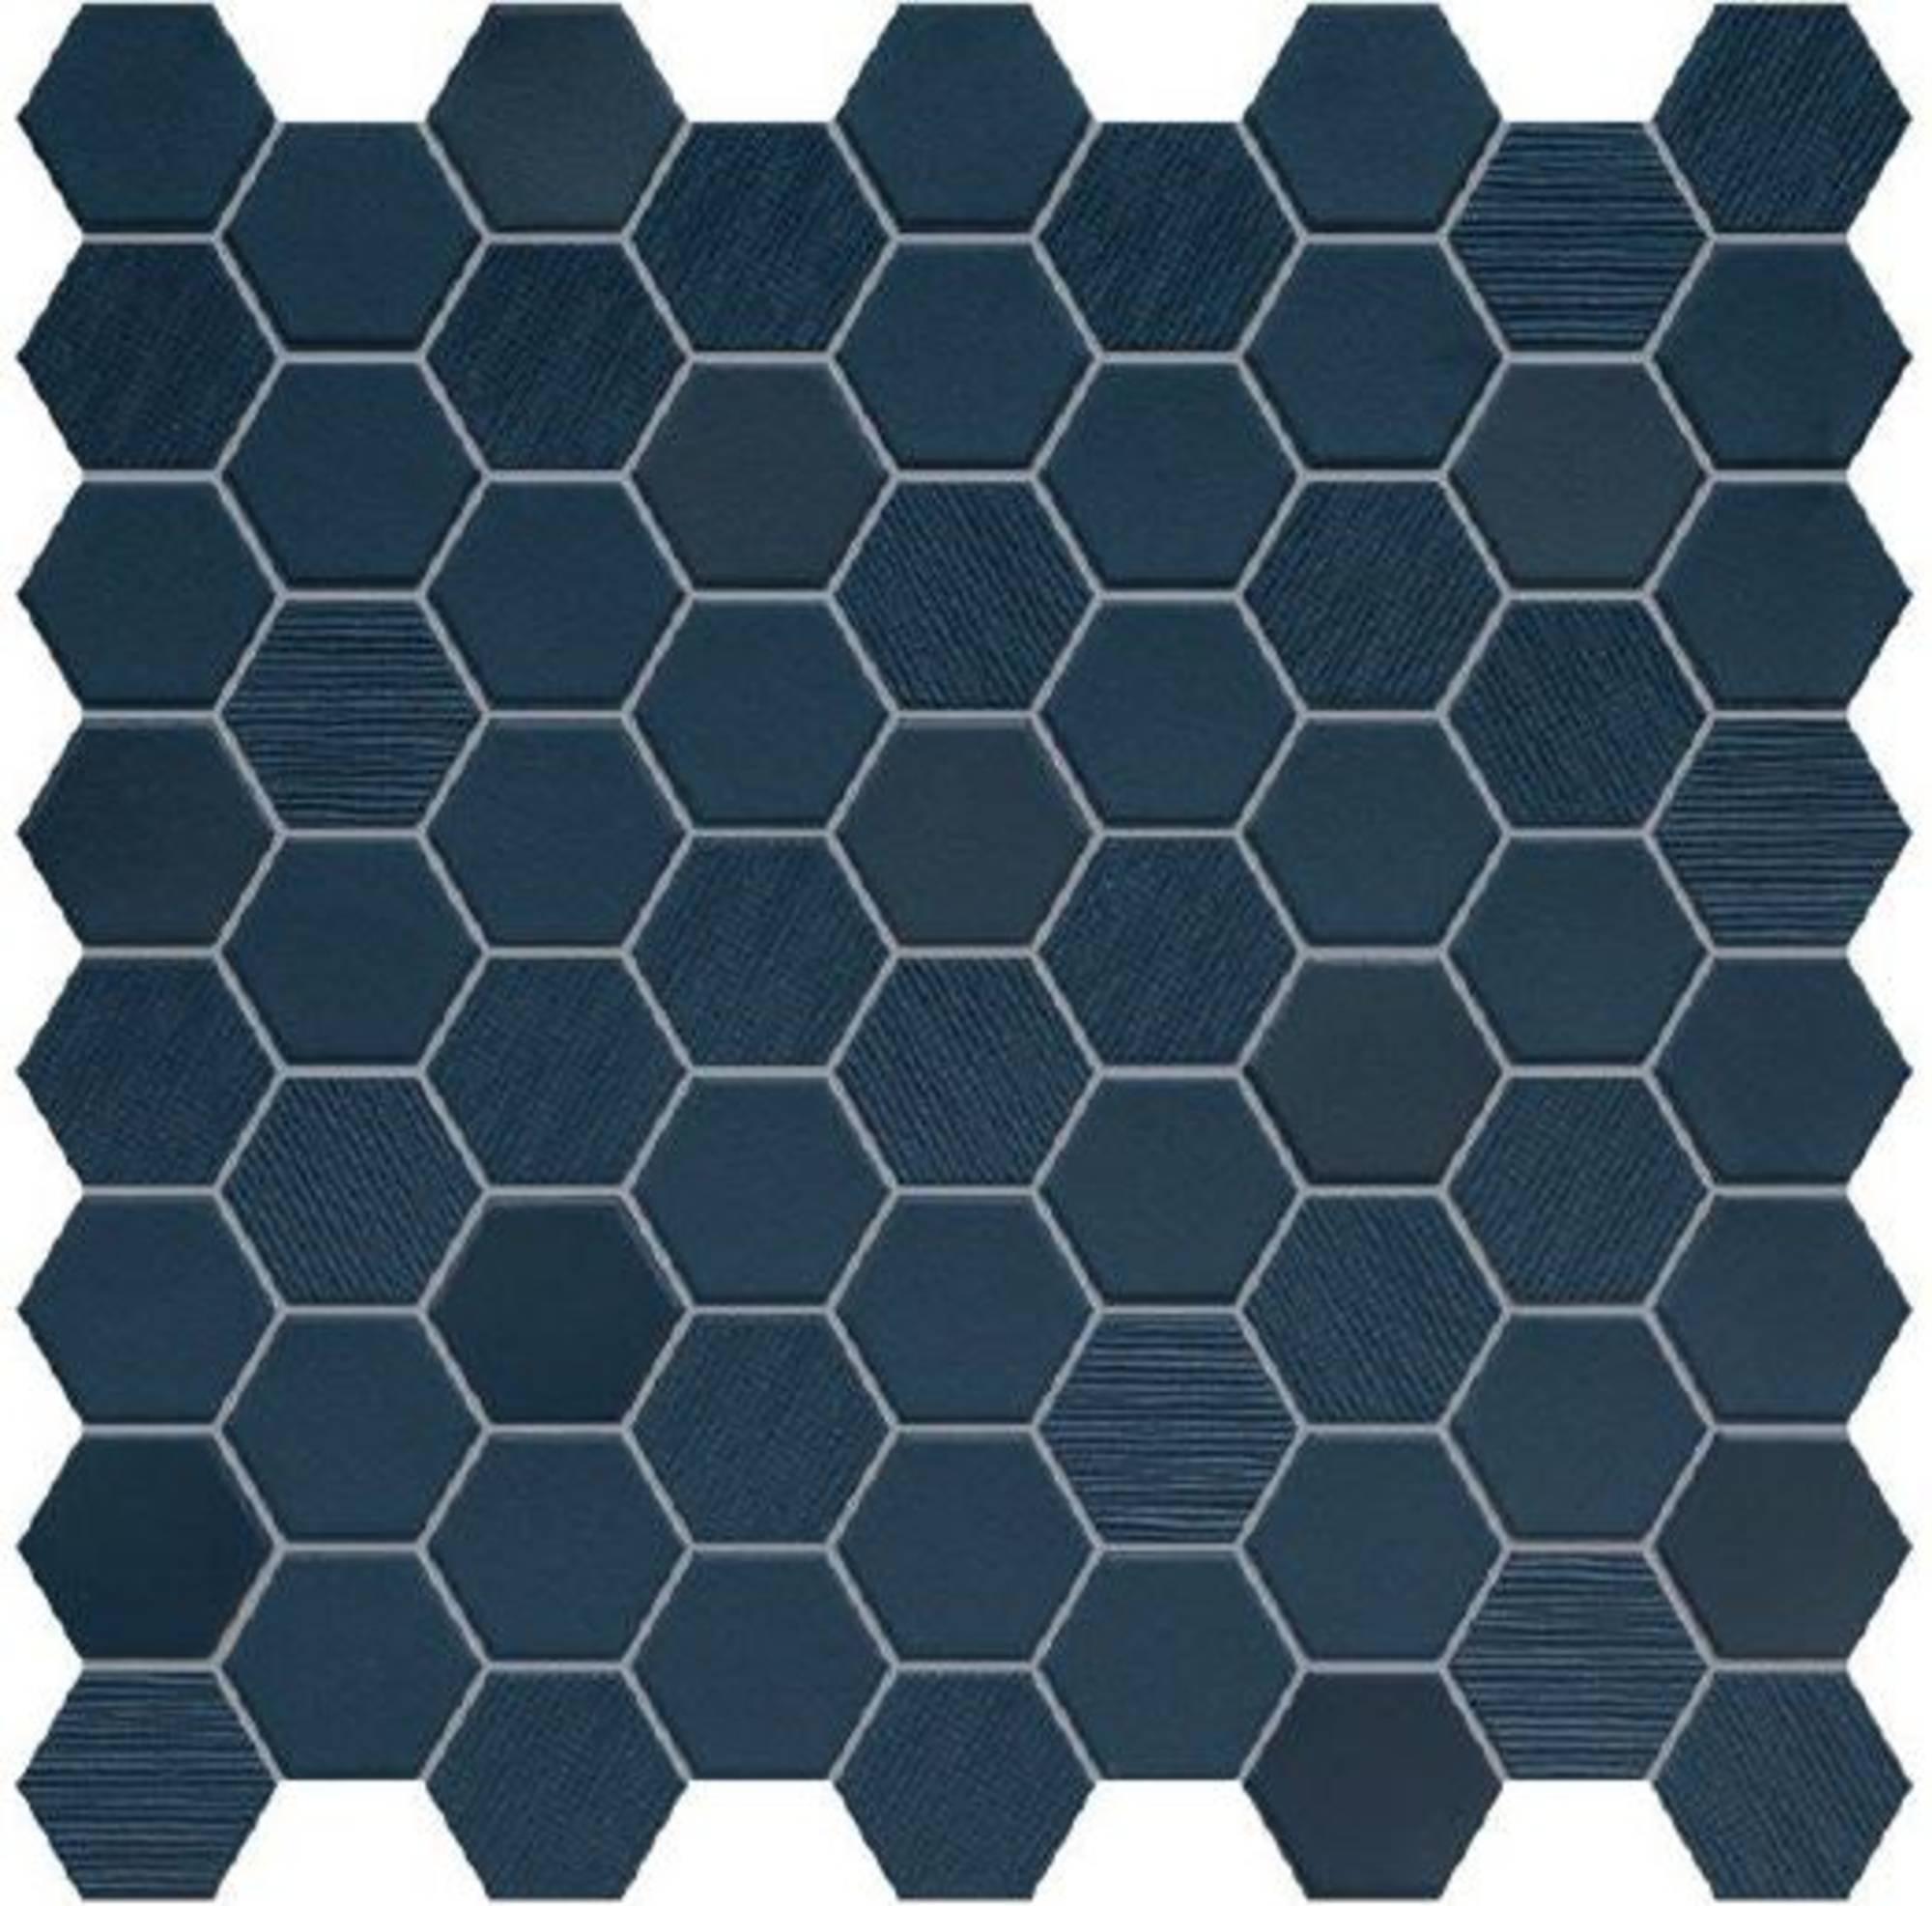 Mozaïek Terratinta Betonstil 31,6x31,6x0,4 cm Hexa Deep Navy 10ST